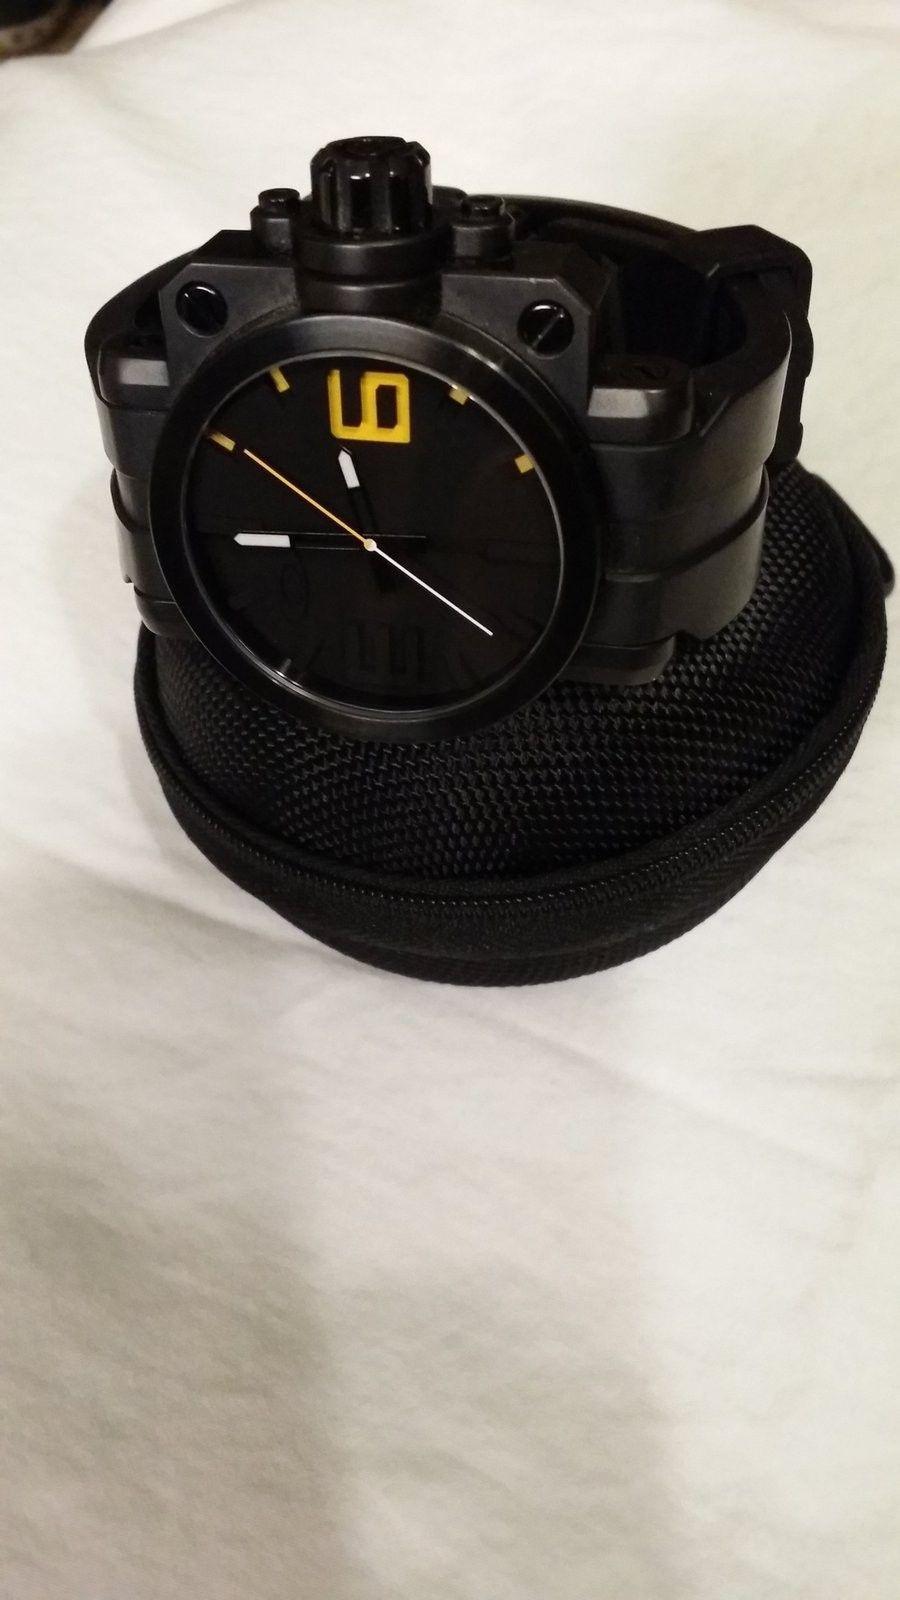 Gearbox Black/Yellow. Price drop! $250 - 20150831_202812.jpg